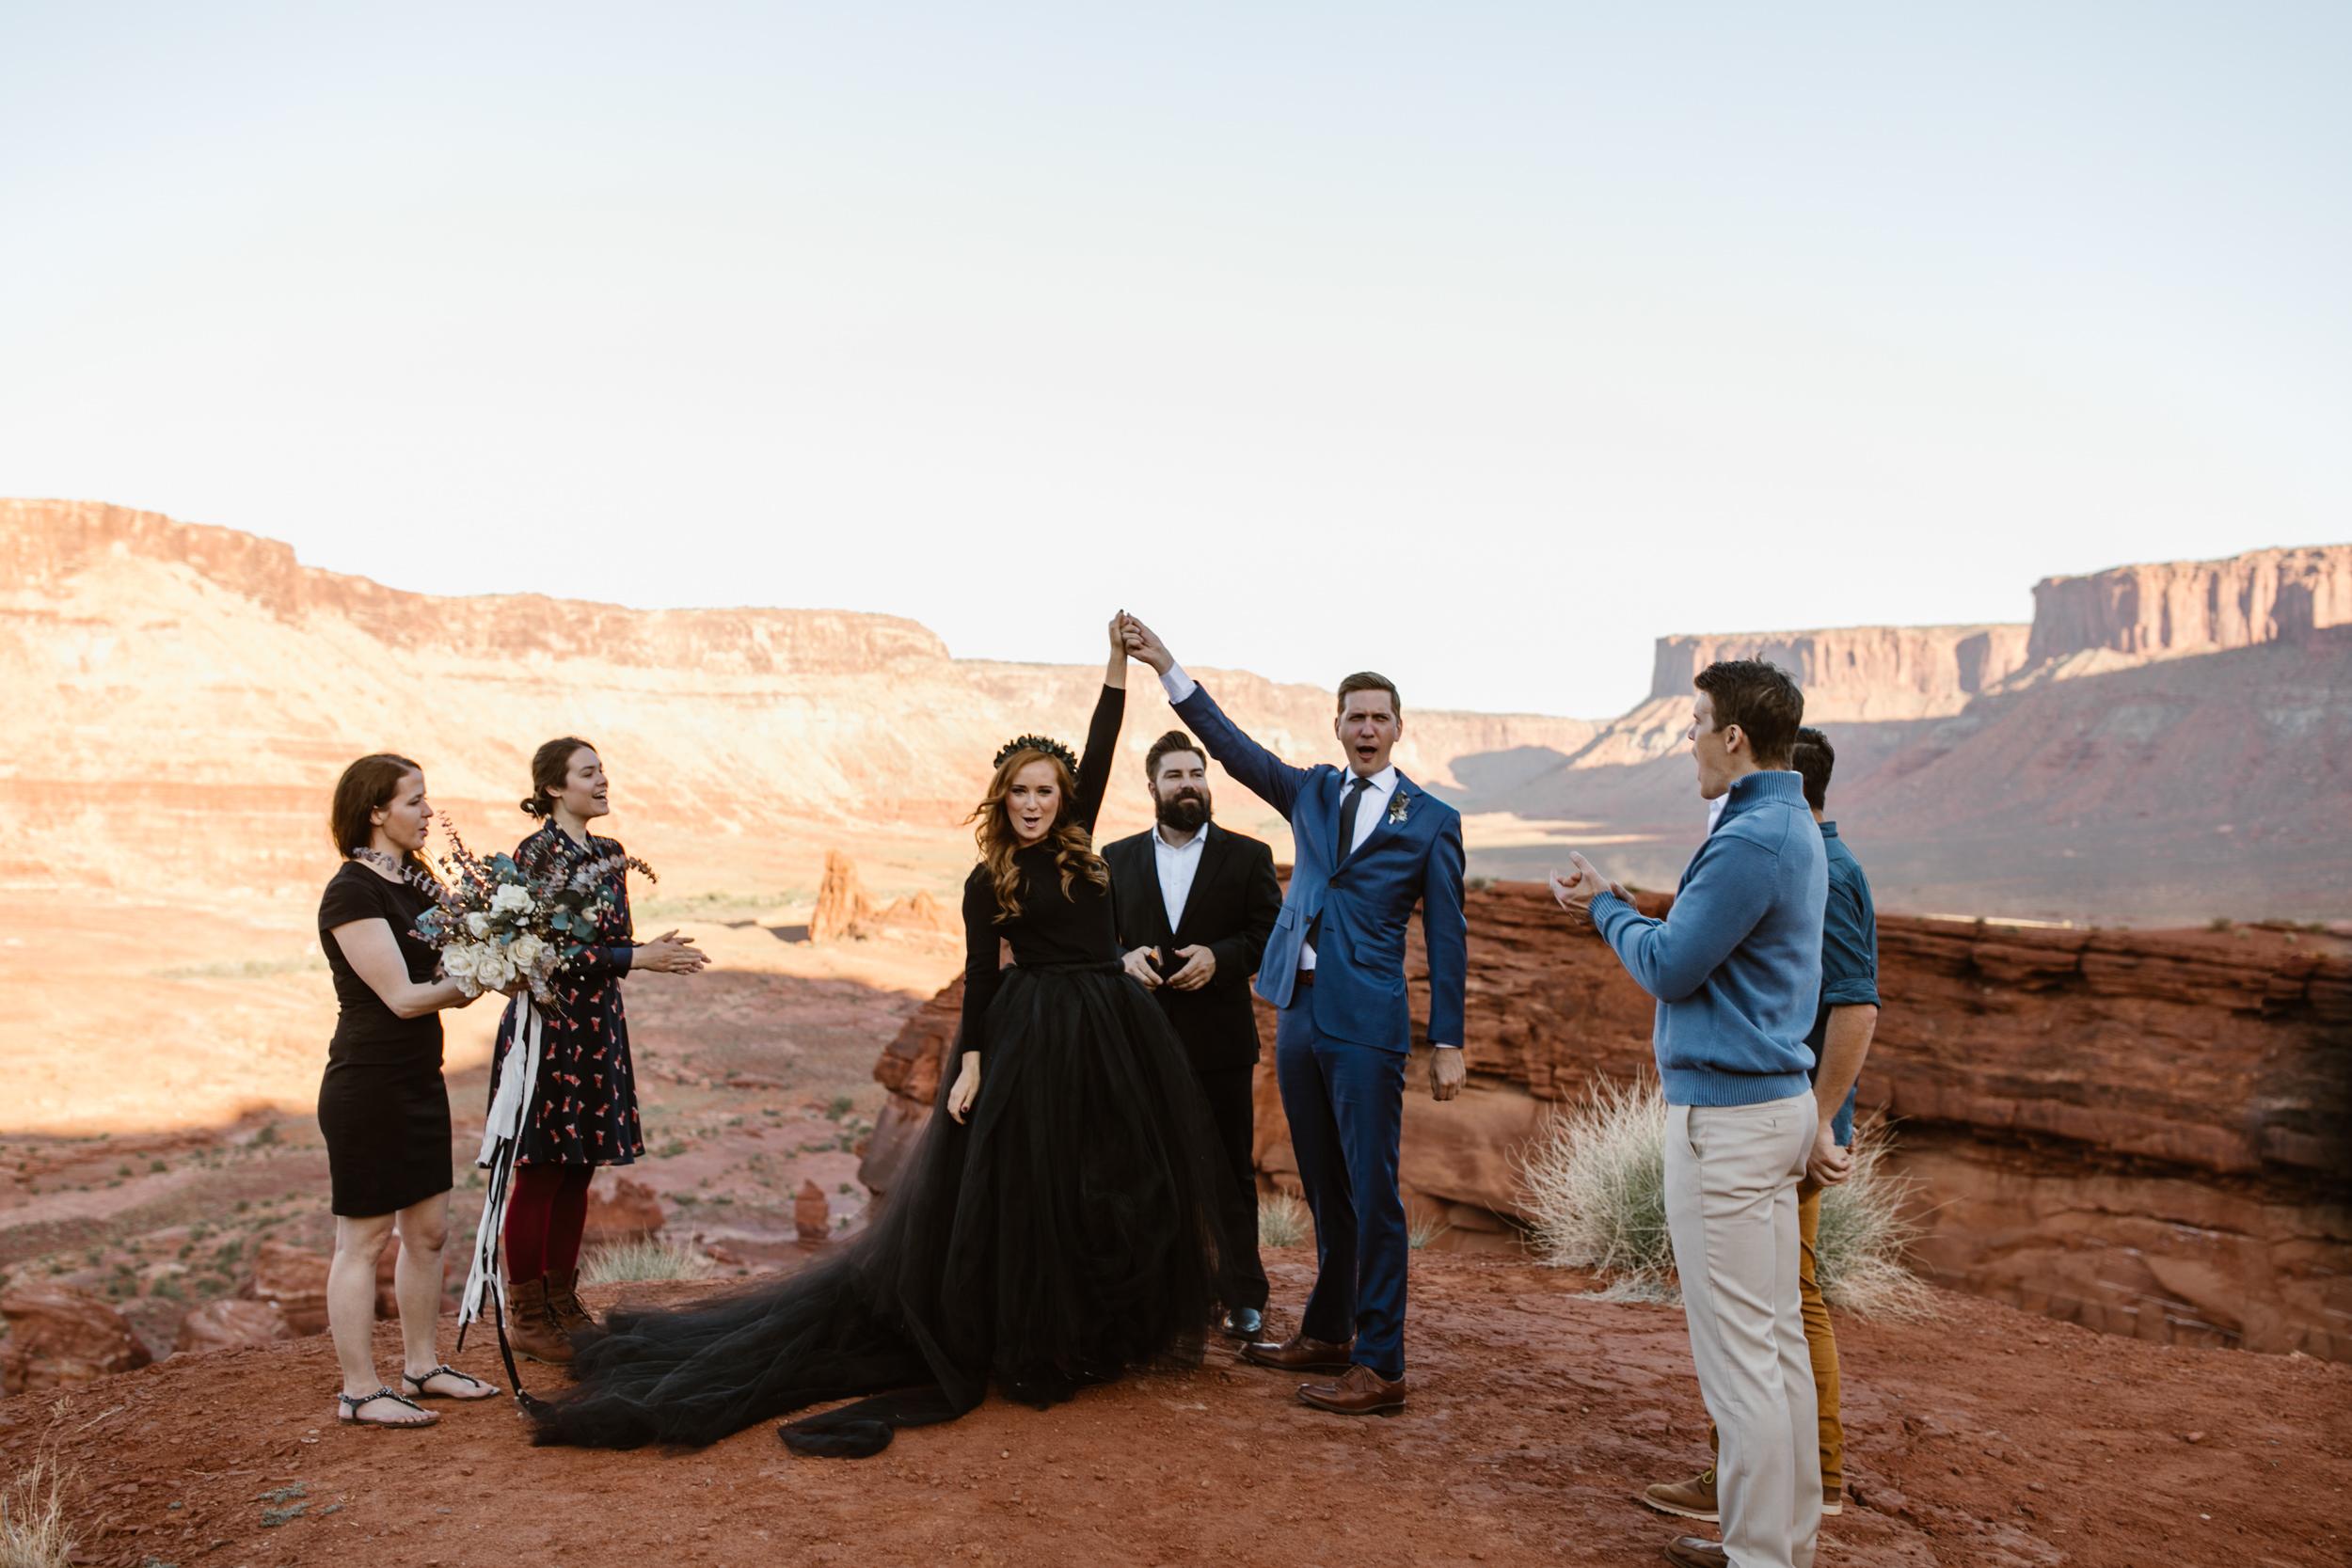 Hearnes-Elopement-Photography-Moab-Utah-Desert-Elopement-Black-Wedding-Dress-Canyonlands-National-Park-Two-Wedding-Dresses-Campfire-Lanterns-Sunset-Elopements-42.jpg